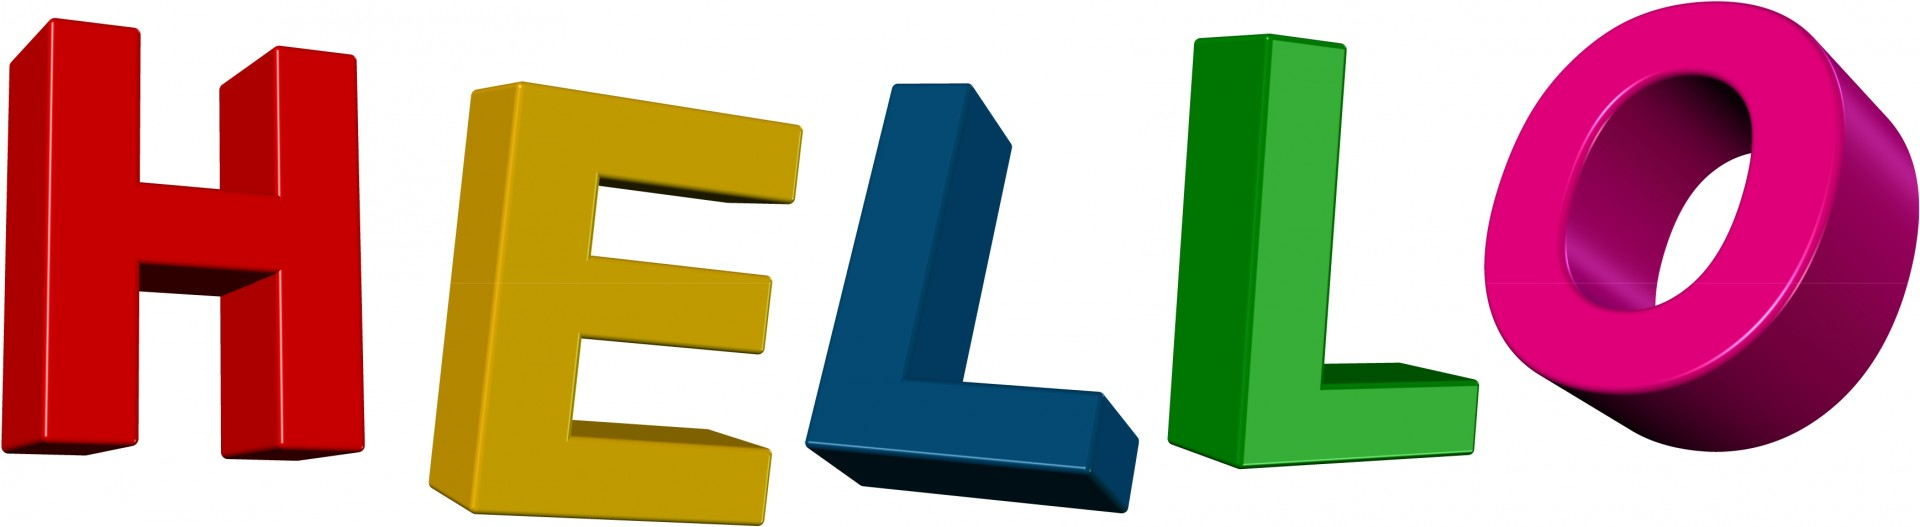 Hello Clip Art Text Free Stock Photo.